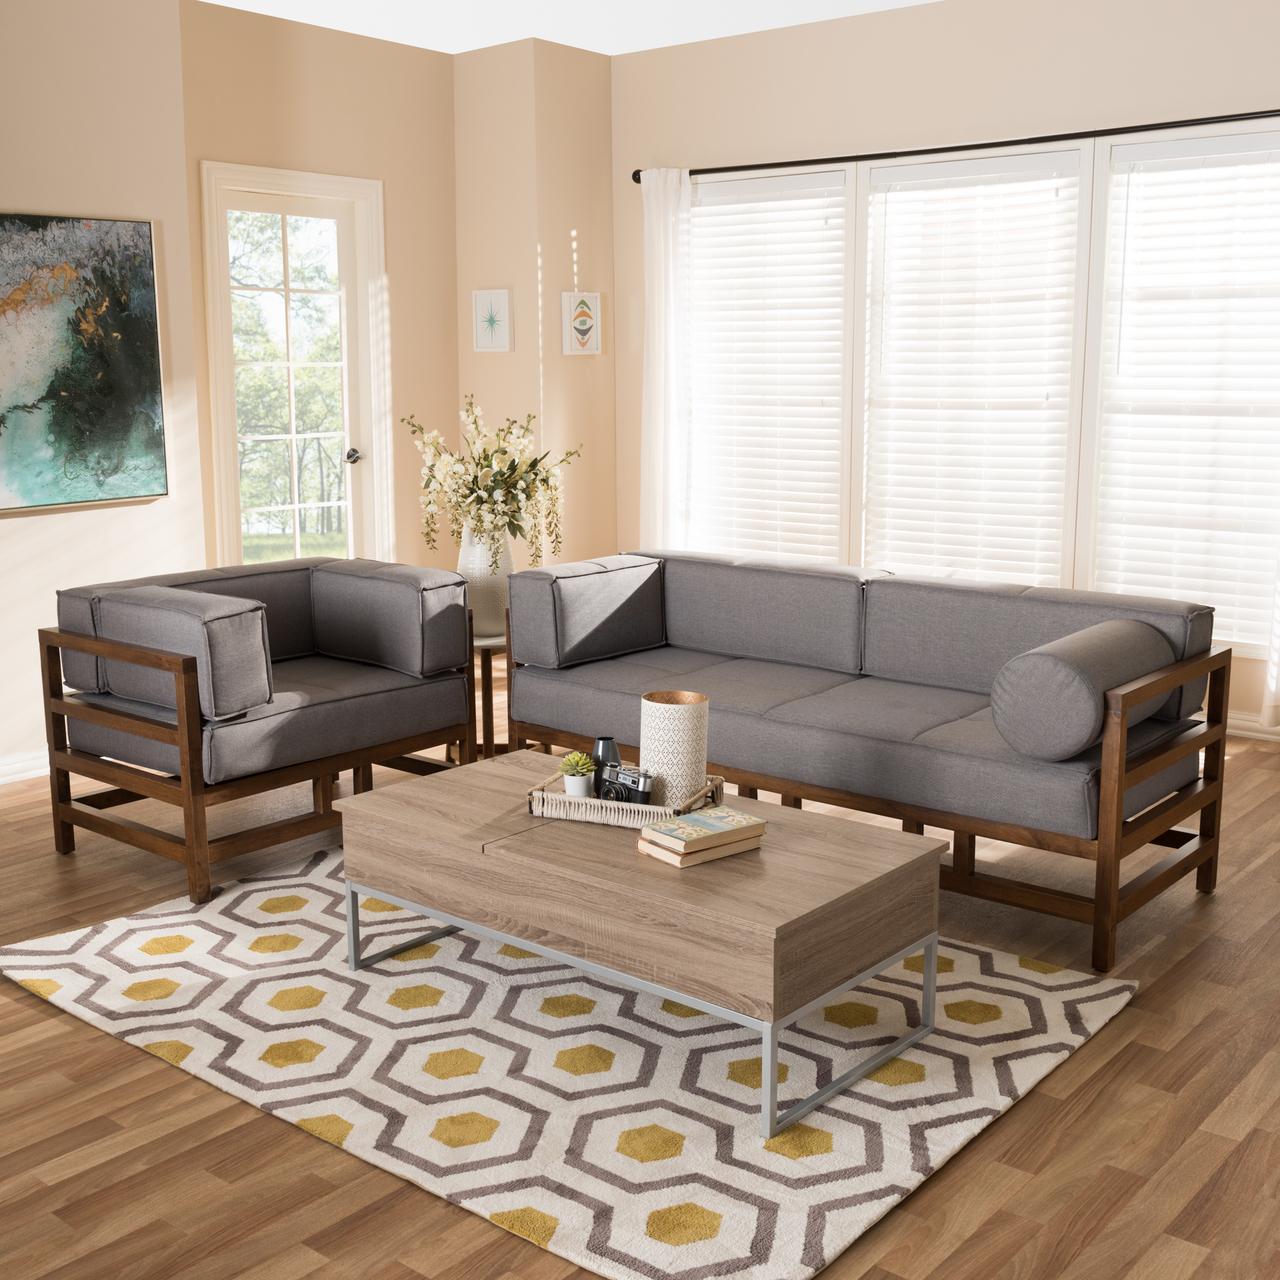 Baxton Studio Shaw Mid-Century Modern Grey Fabric Upholstered Walnut Wood  2-Piece Living Room Sofa Set